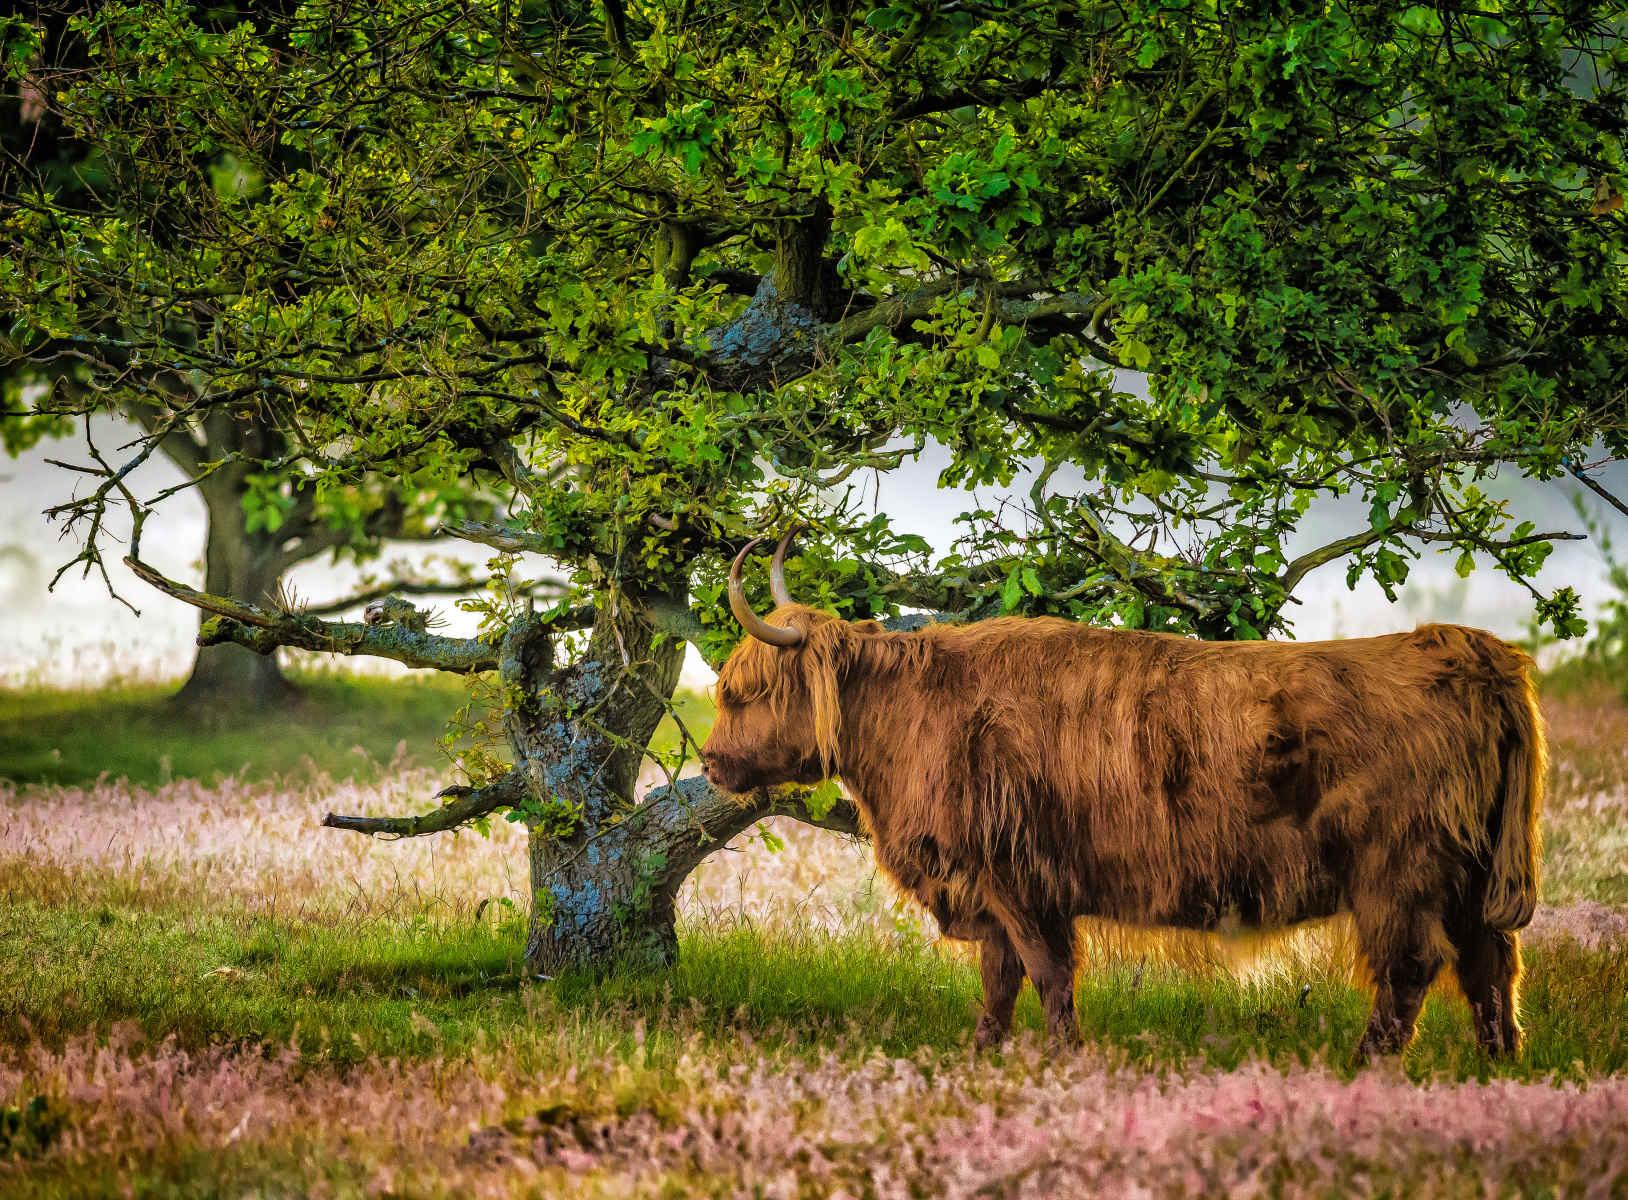 highland cow under oak tree